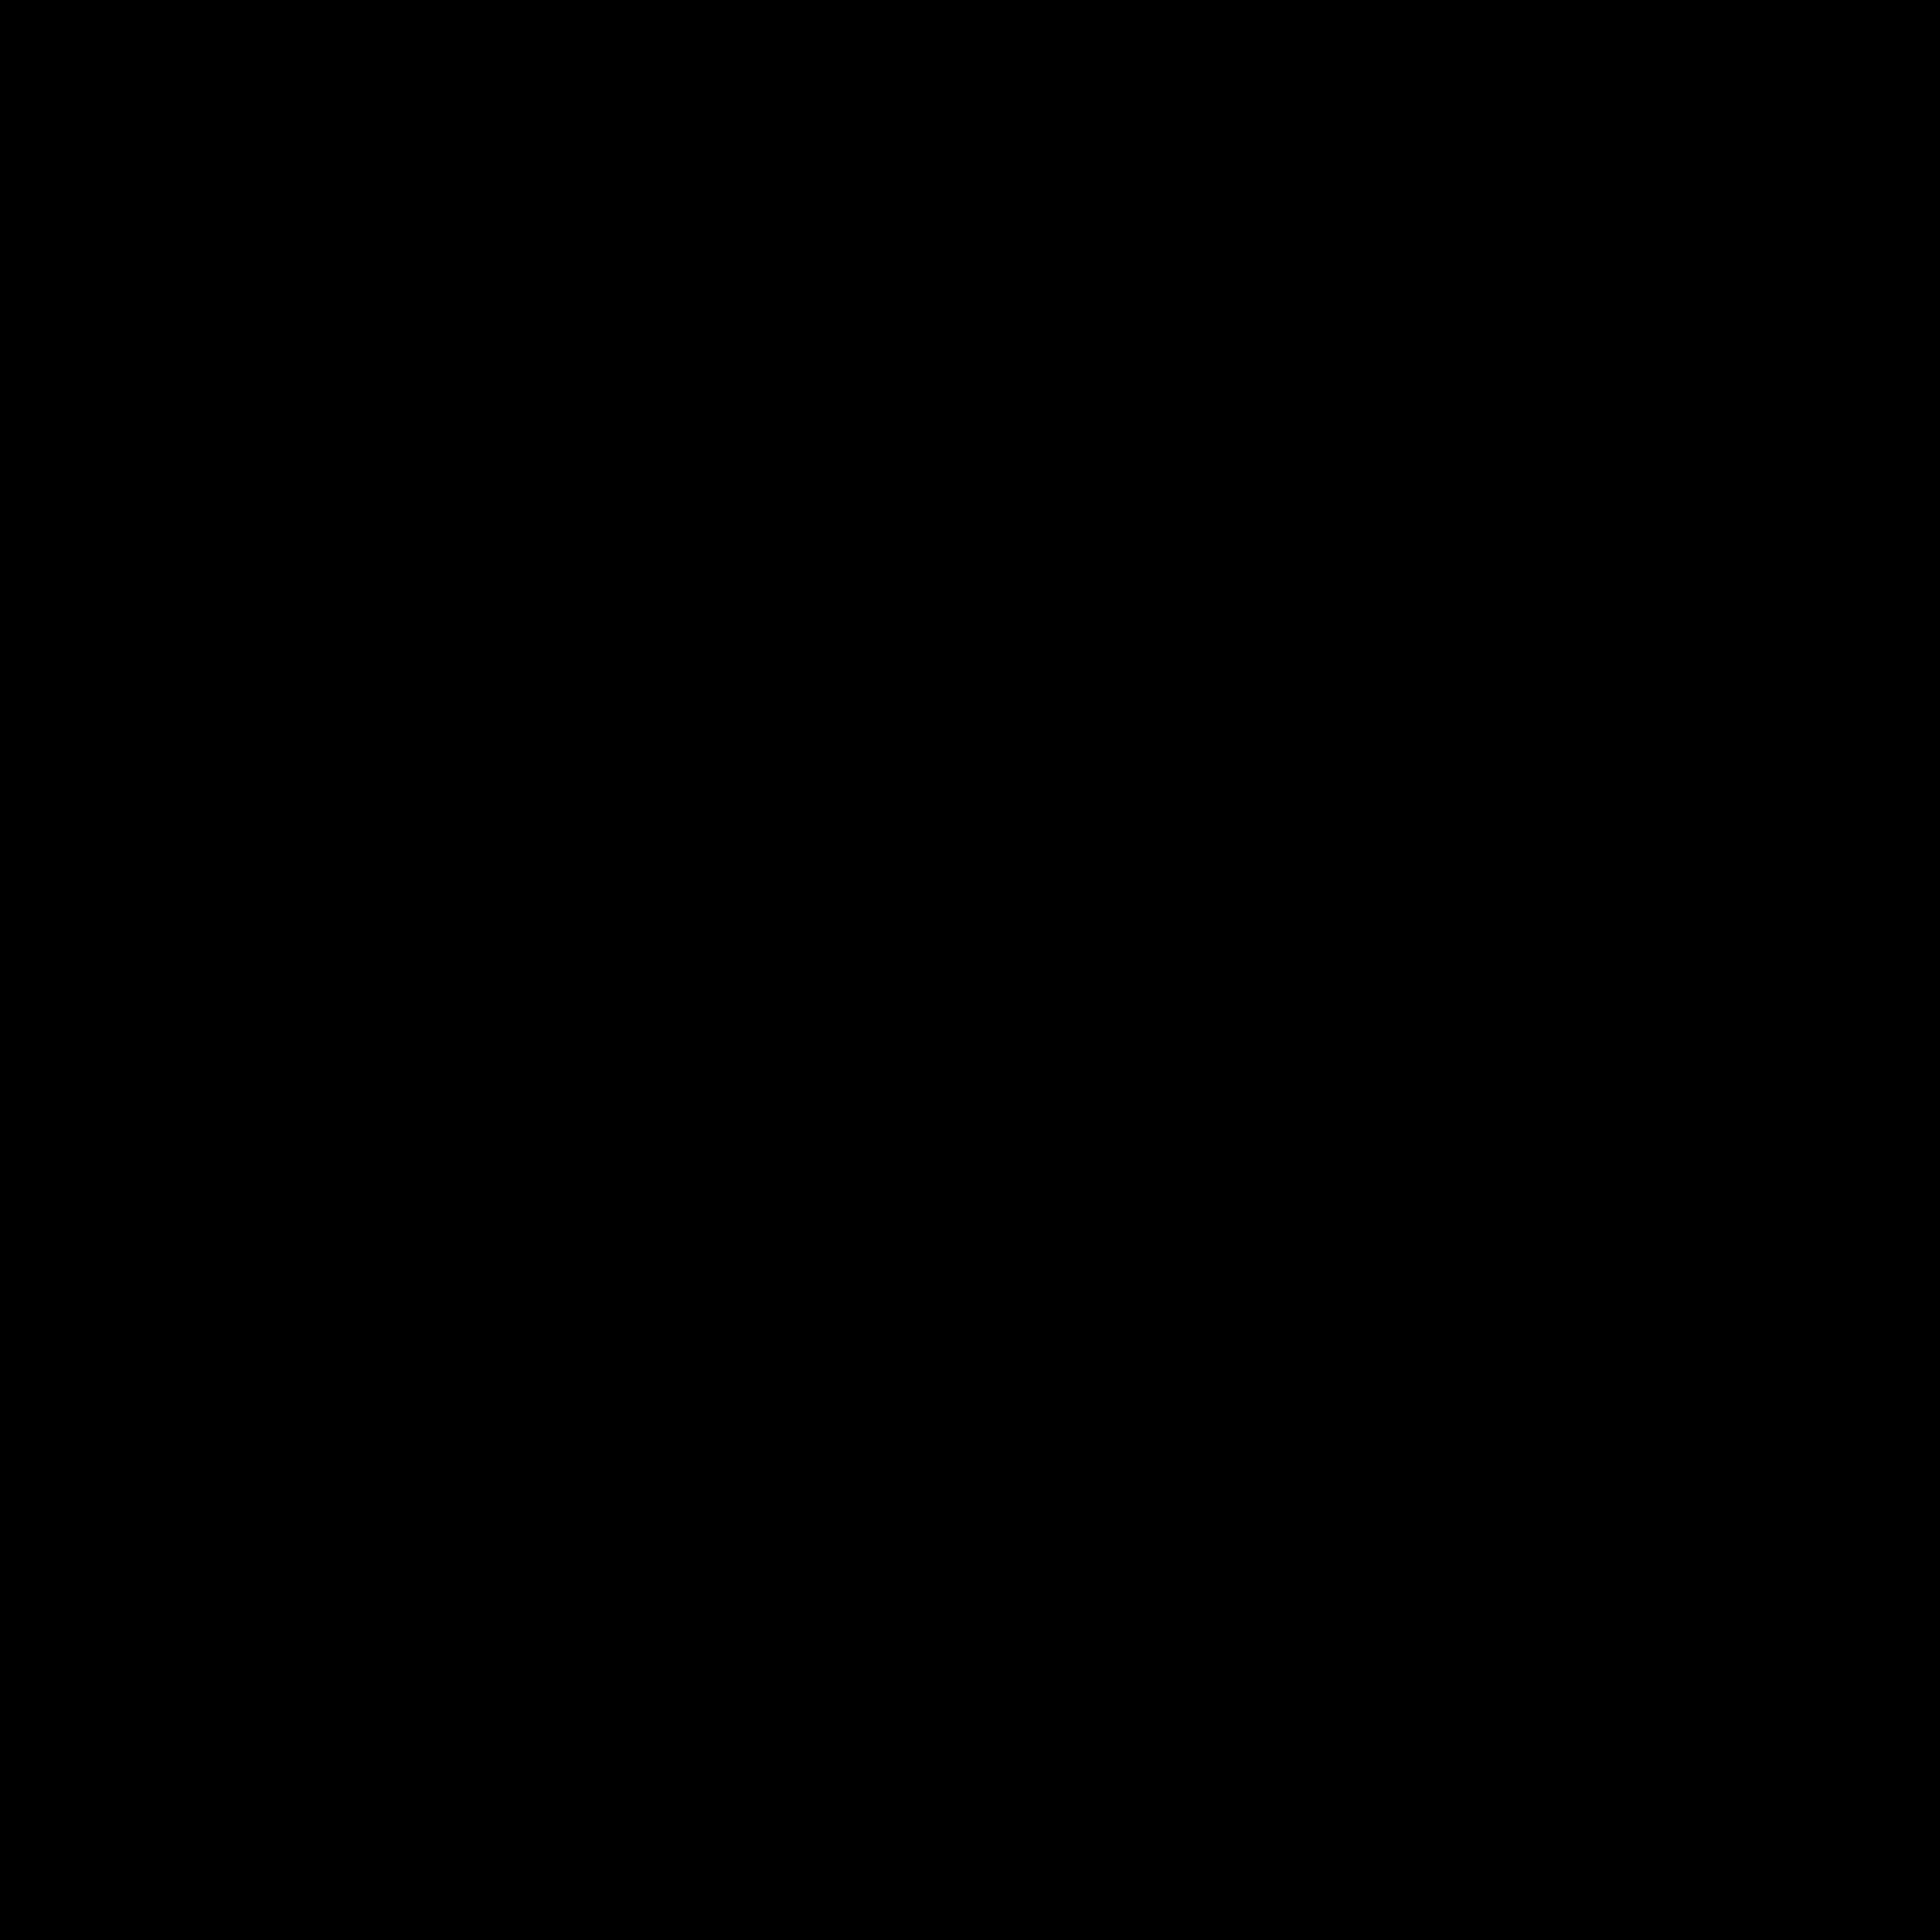 Deloitte Touche Tohmatsu International Logo PNG Transparent